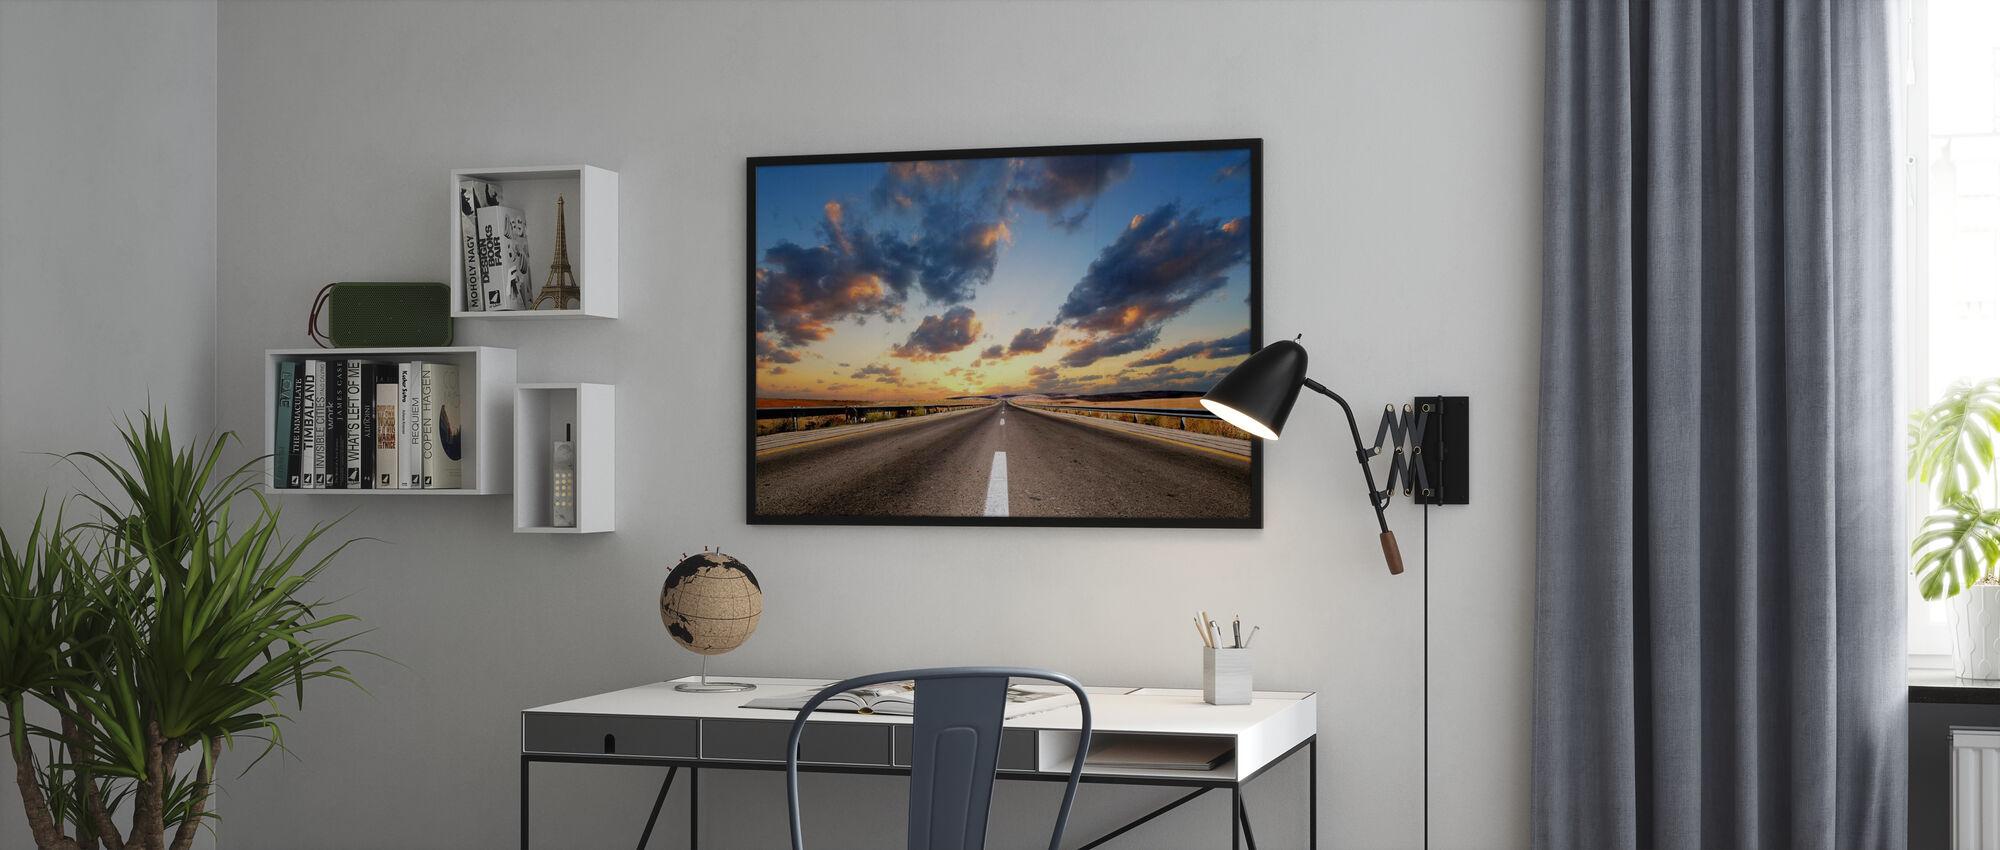 Vägen under Dramatisk himmel - Poster - Kontor